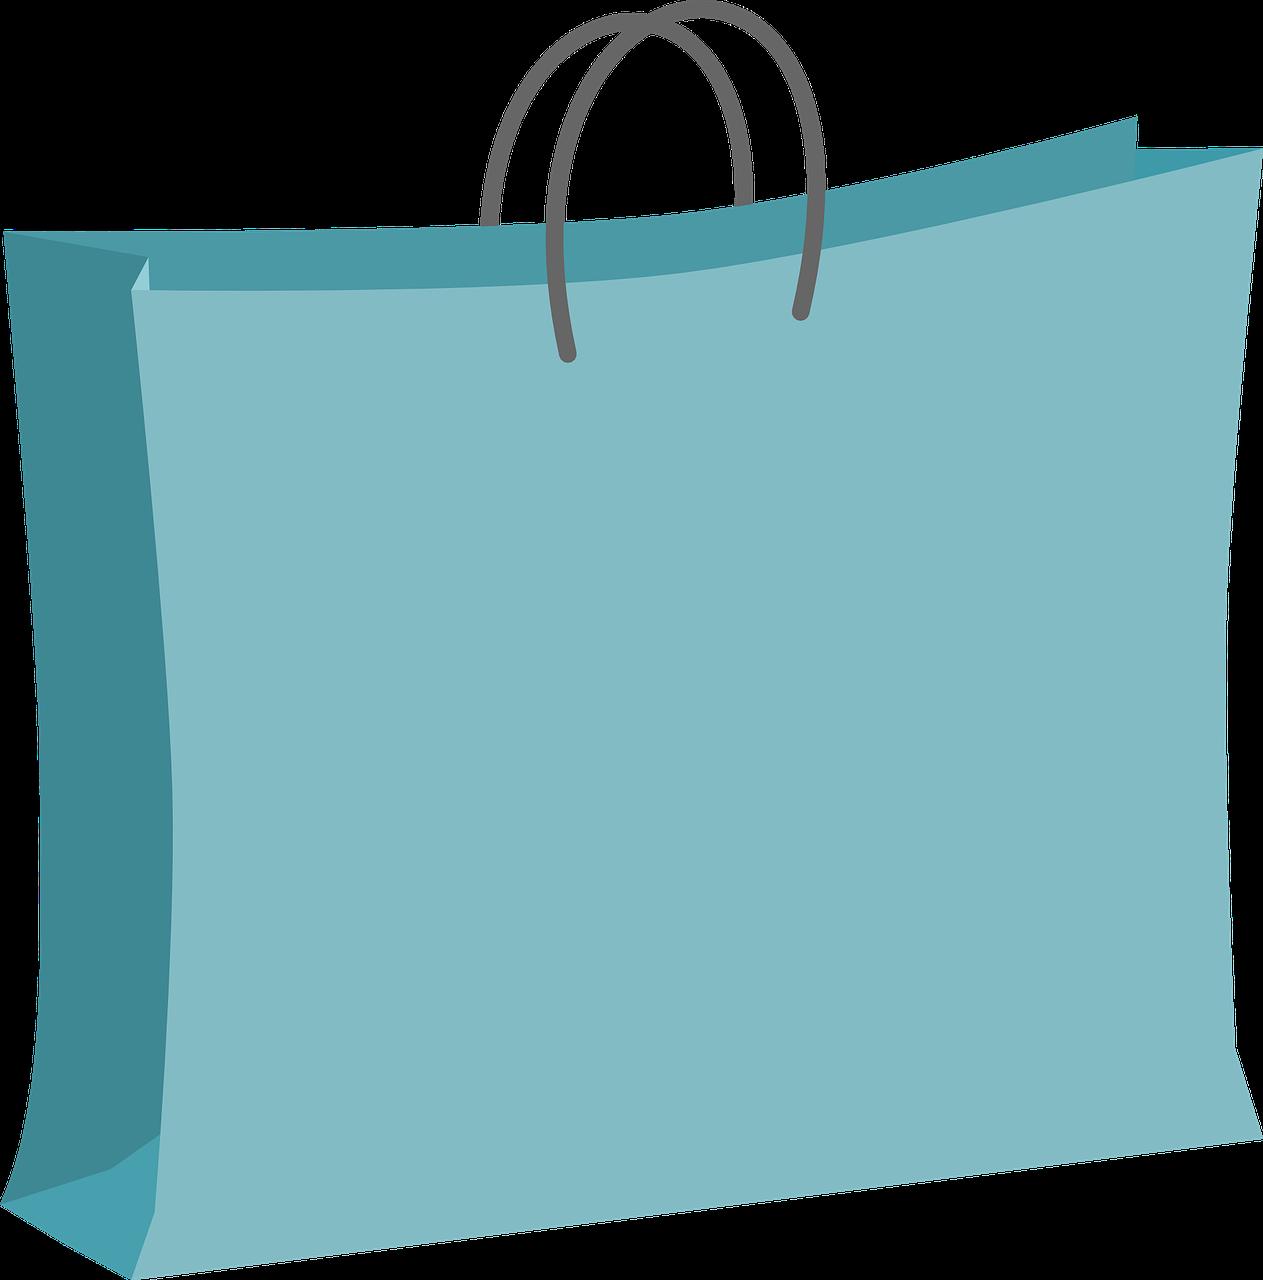 1263x1280 Free To Use Amp Public Domain Shopping Bag Clip Art